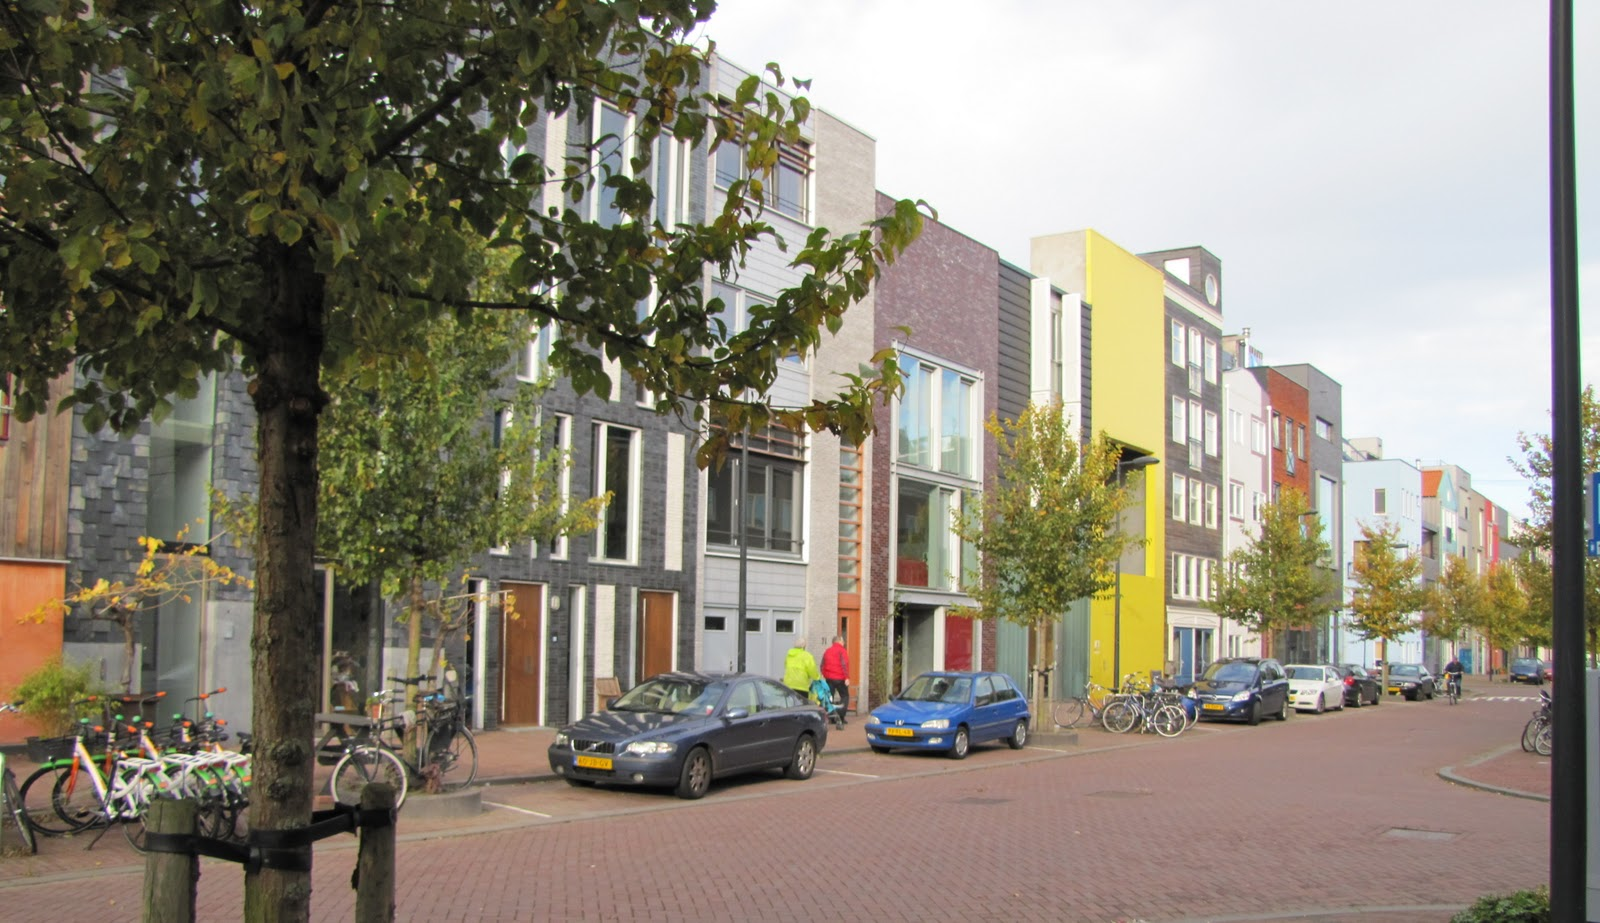 Ijburg: amsterdam by the sea: architecture